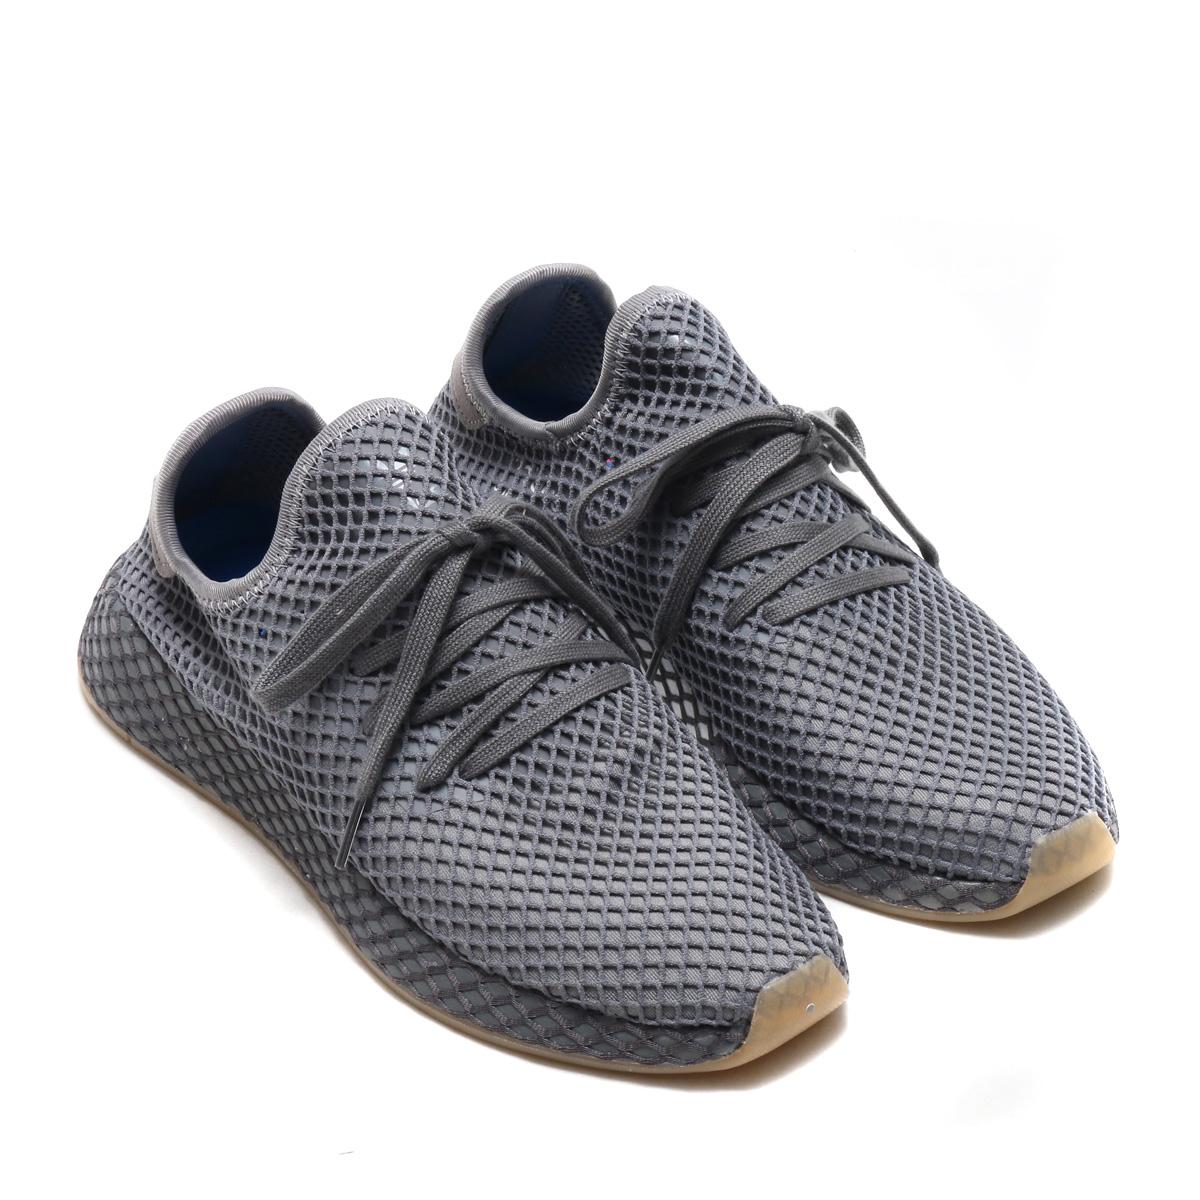 adidas Originals DEERUPT RUNNER(アディダス オリジナルス ディーラプト ランナー)(グレースリーF17/グレーフォアF17/ランニングホワイト)18SS-I